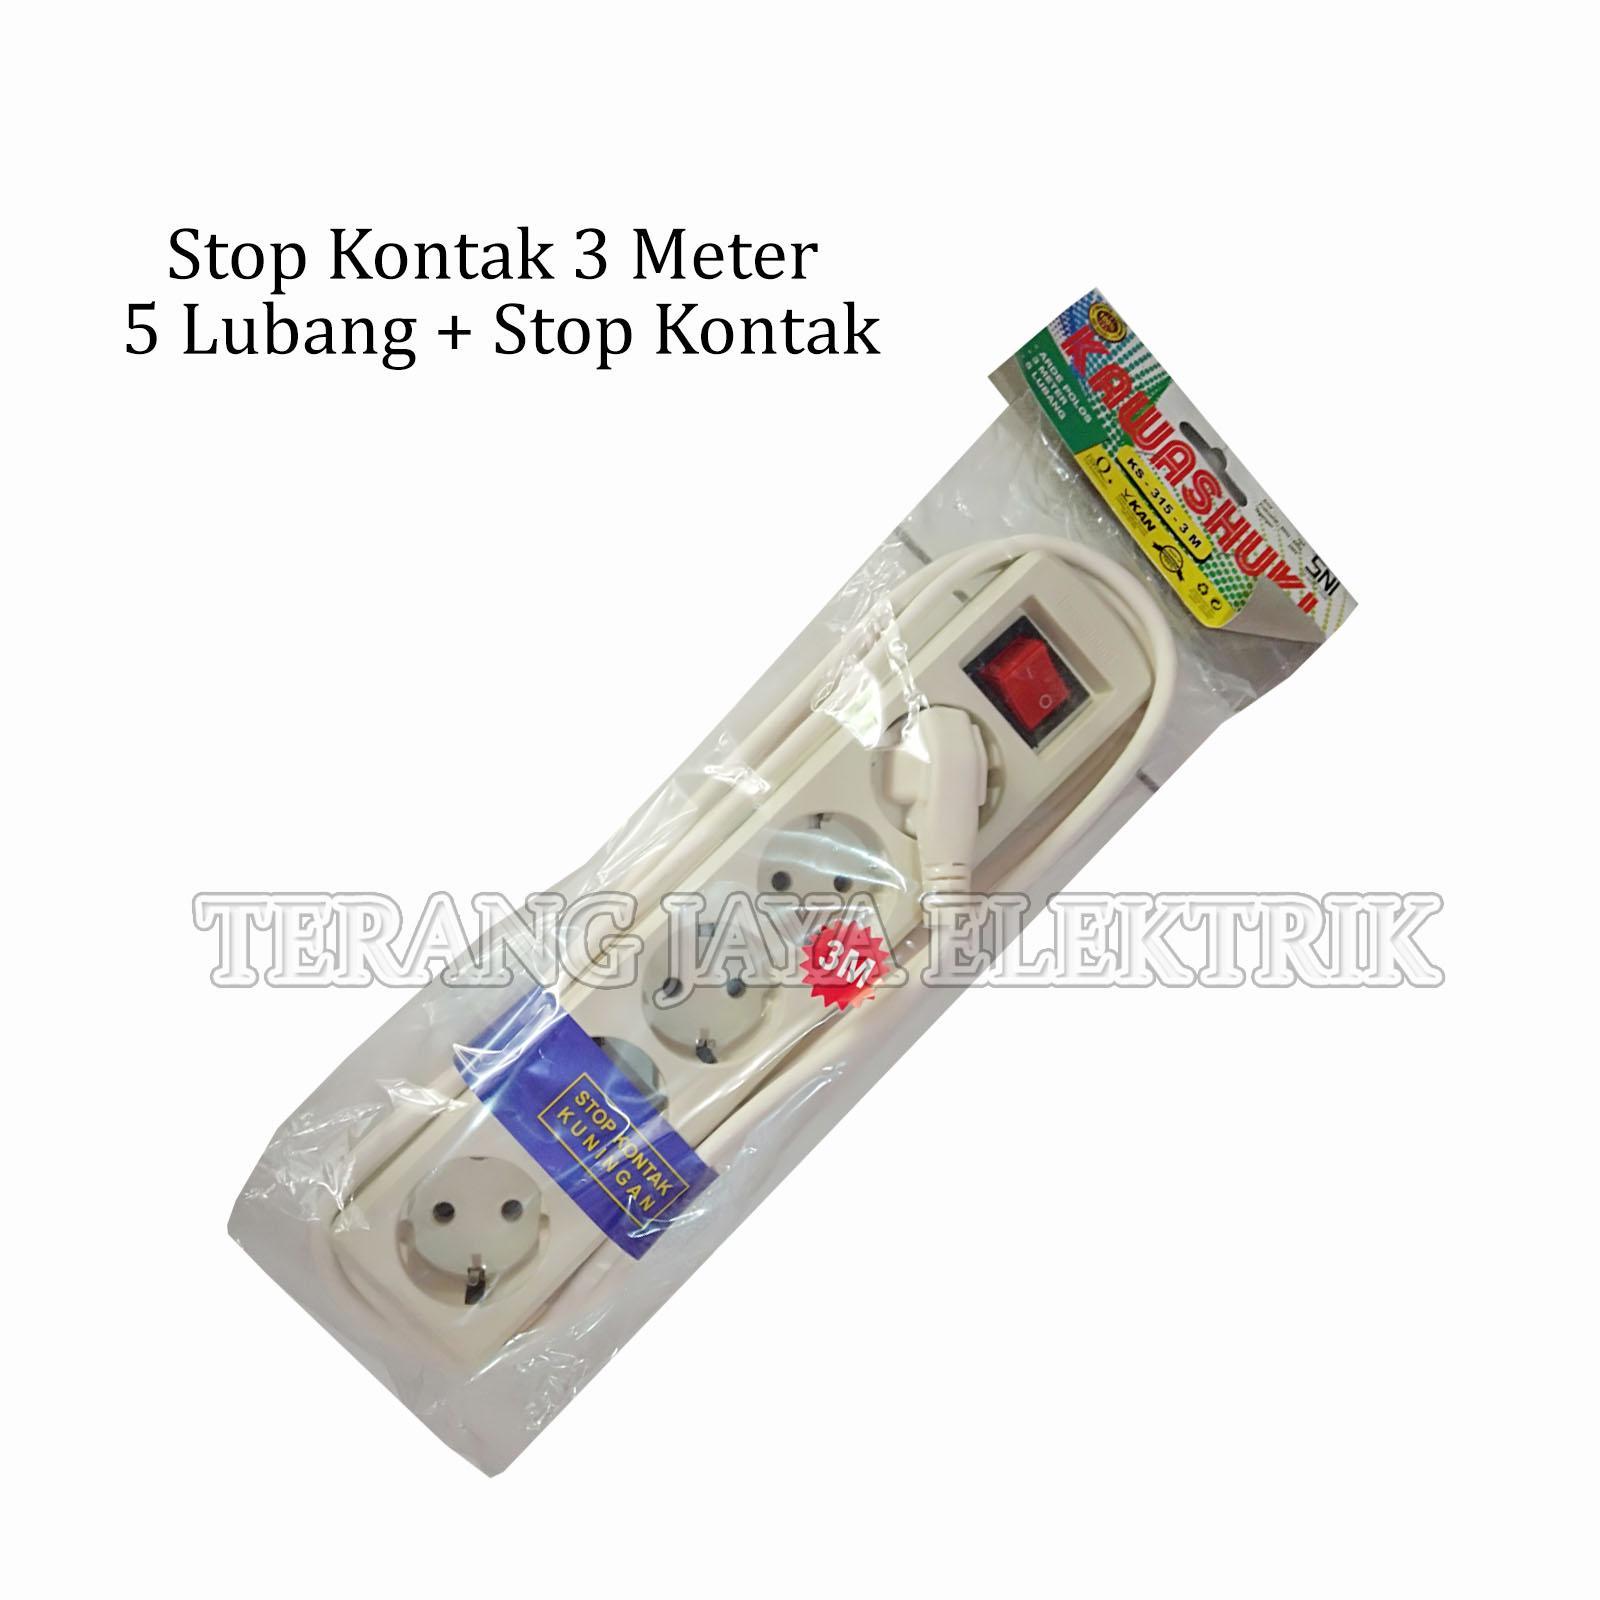 Detail Gambar Stop Kontak/Colokan Listrik 3 Meter 5 Lubang + Switch KAWASHUKI Terbaru